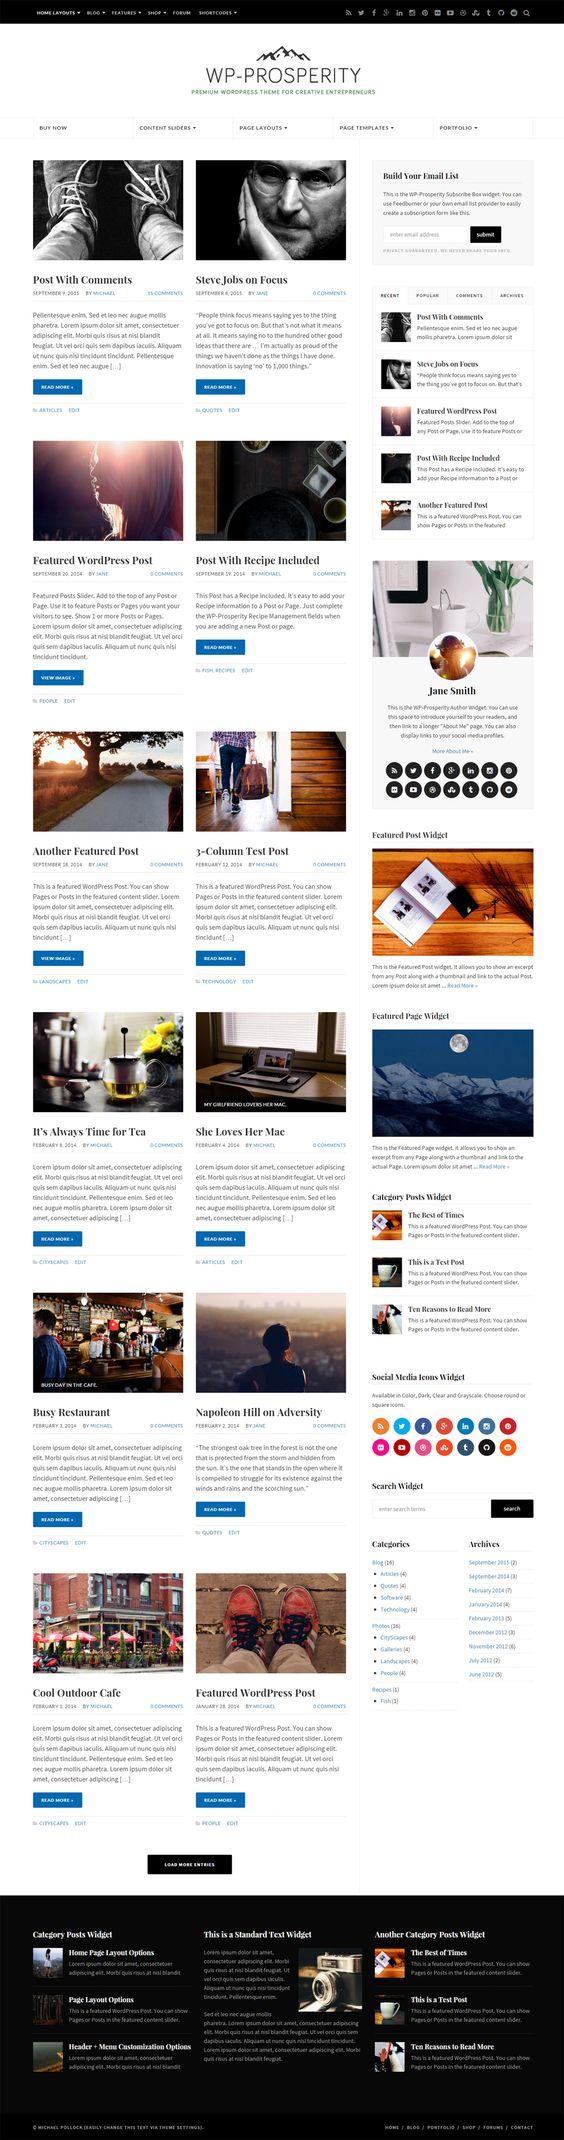 WP-Prosperity Premium Responsive WordPress Themes